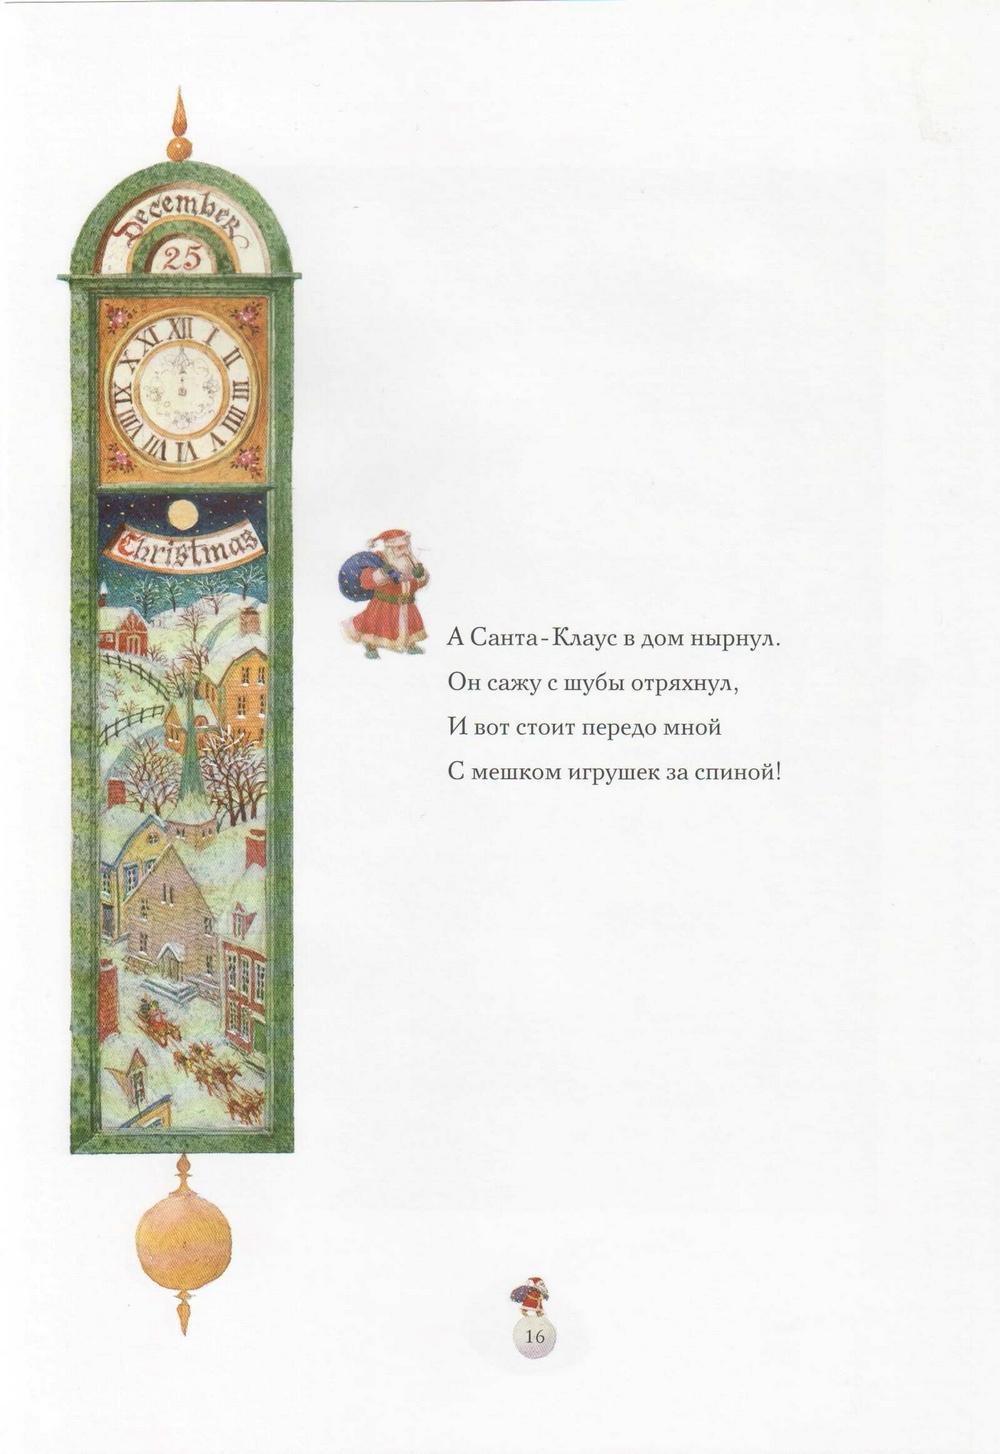 http://i6.imageban.ru/out/2013/11/25/f9feab43c9e814d0a844c70c4762487c.jpg